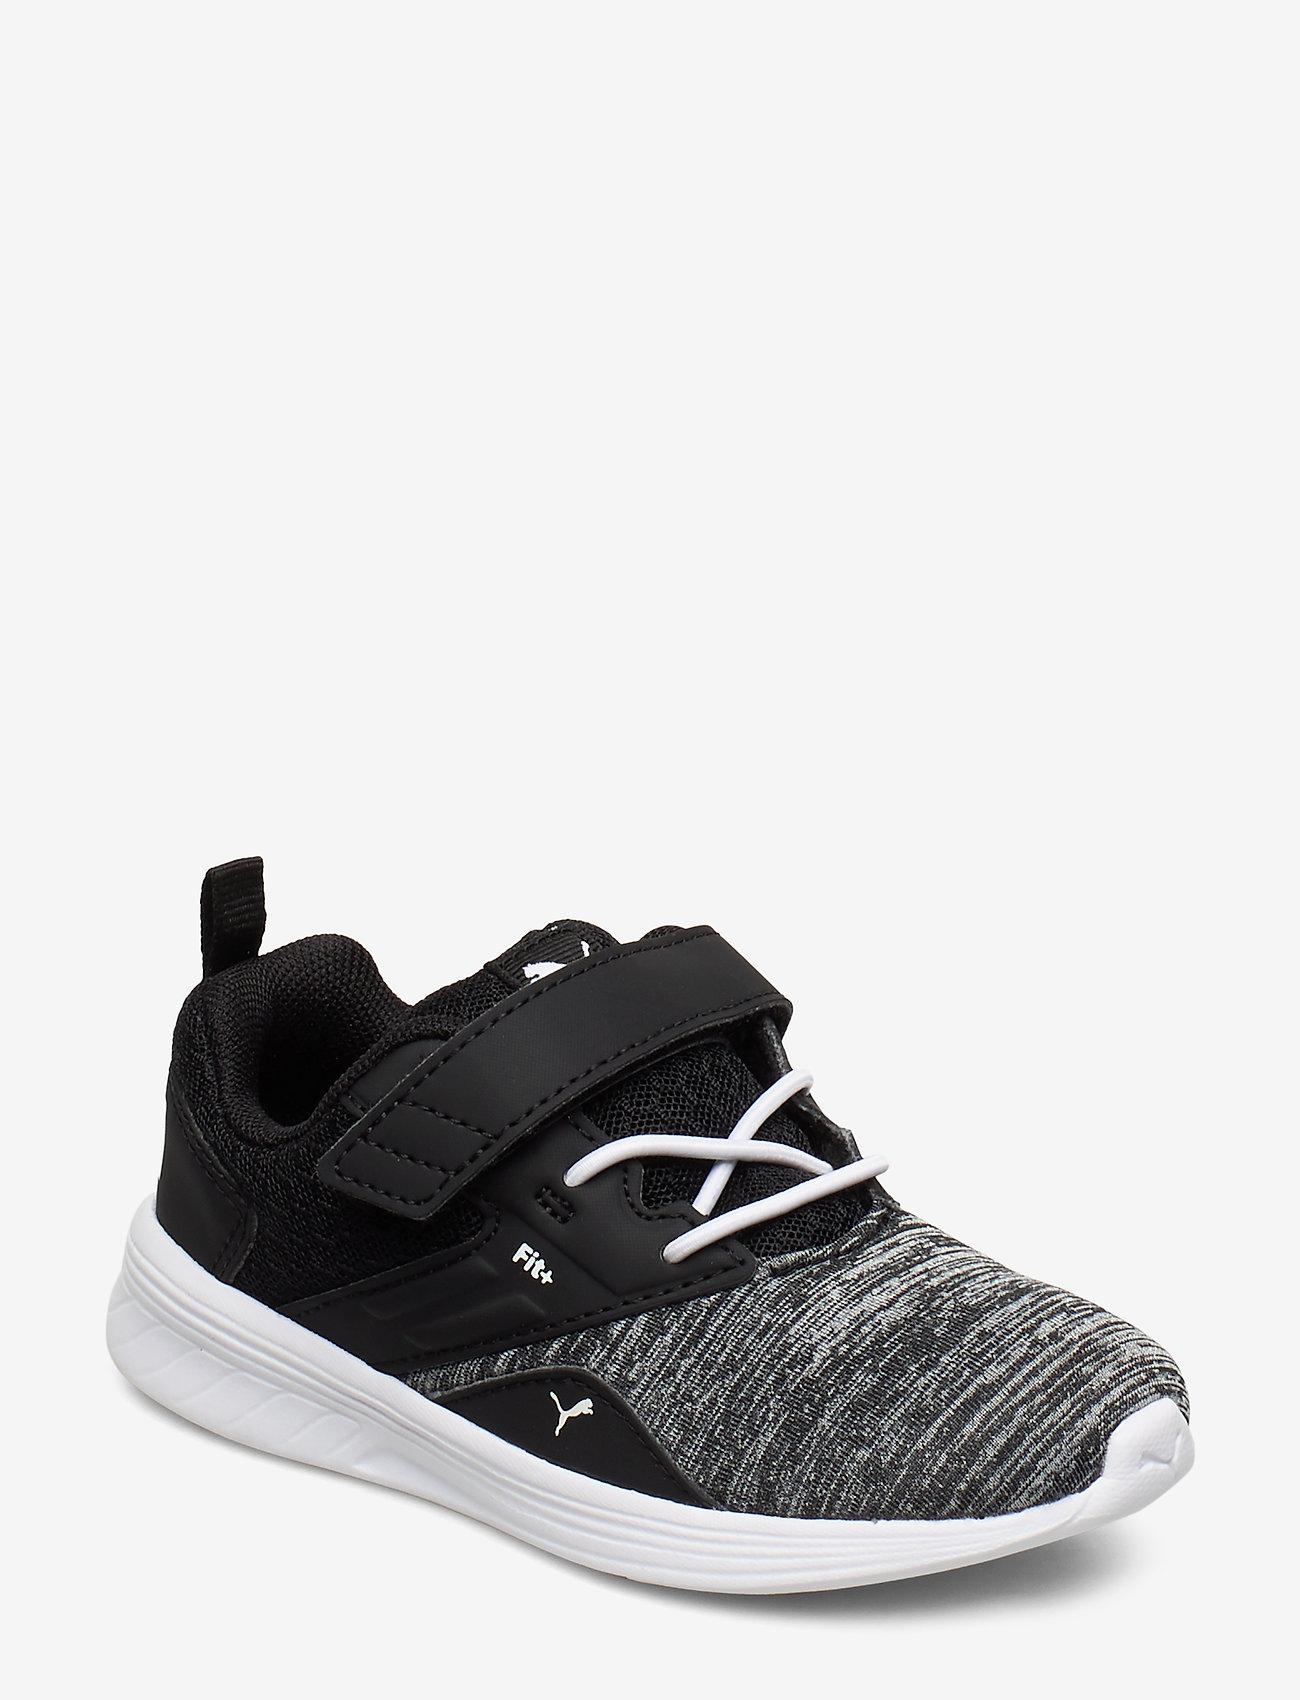 PUMA Comet V Inf - Sneakers   Boozt.com